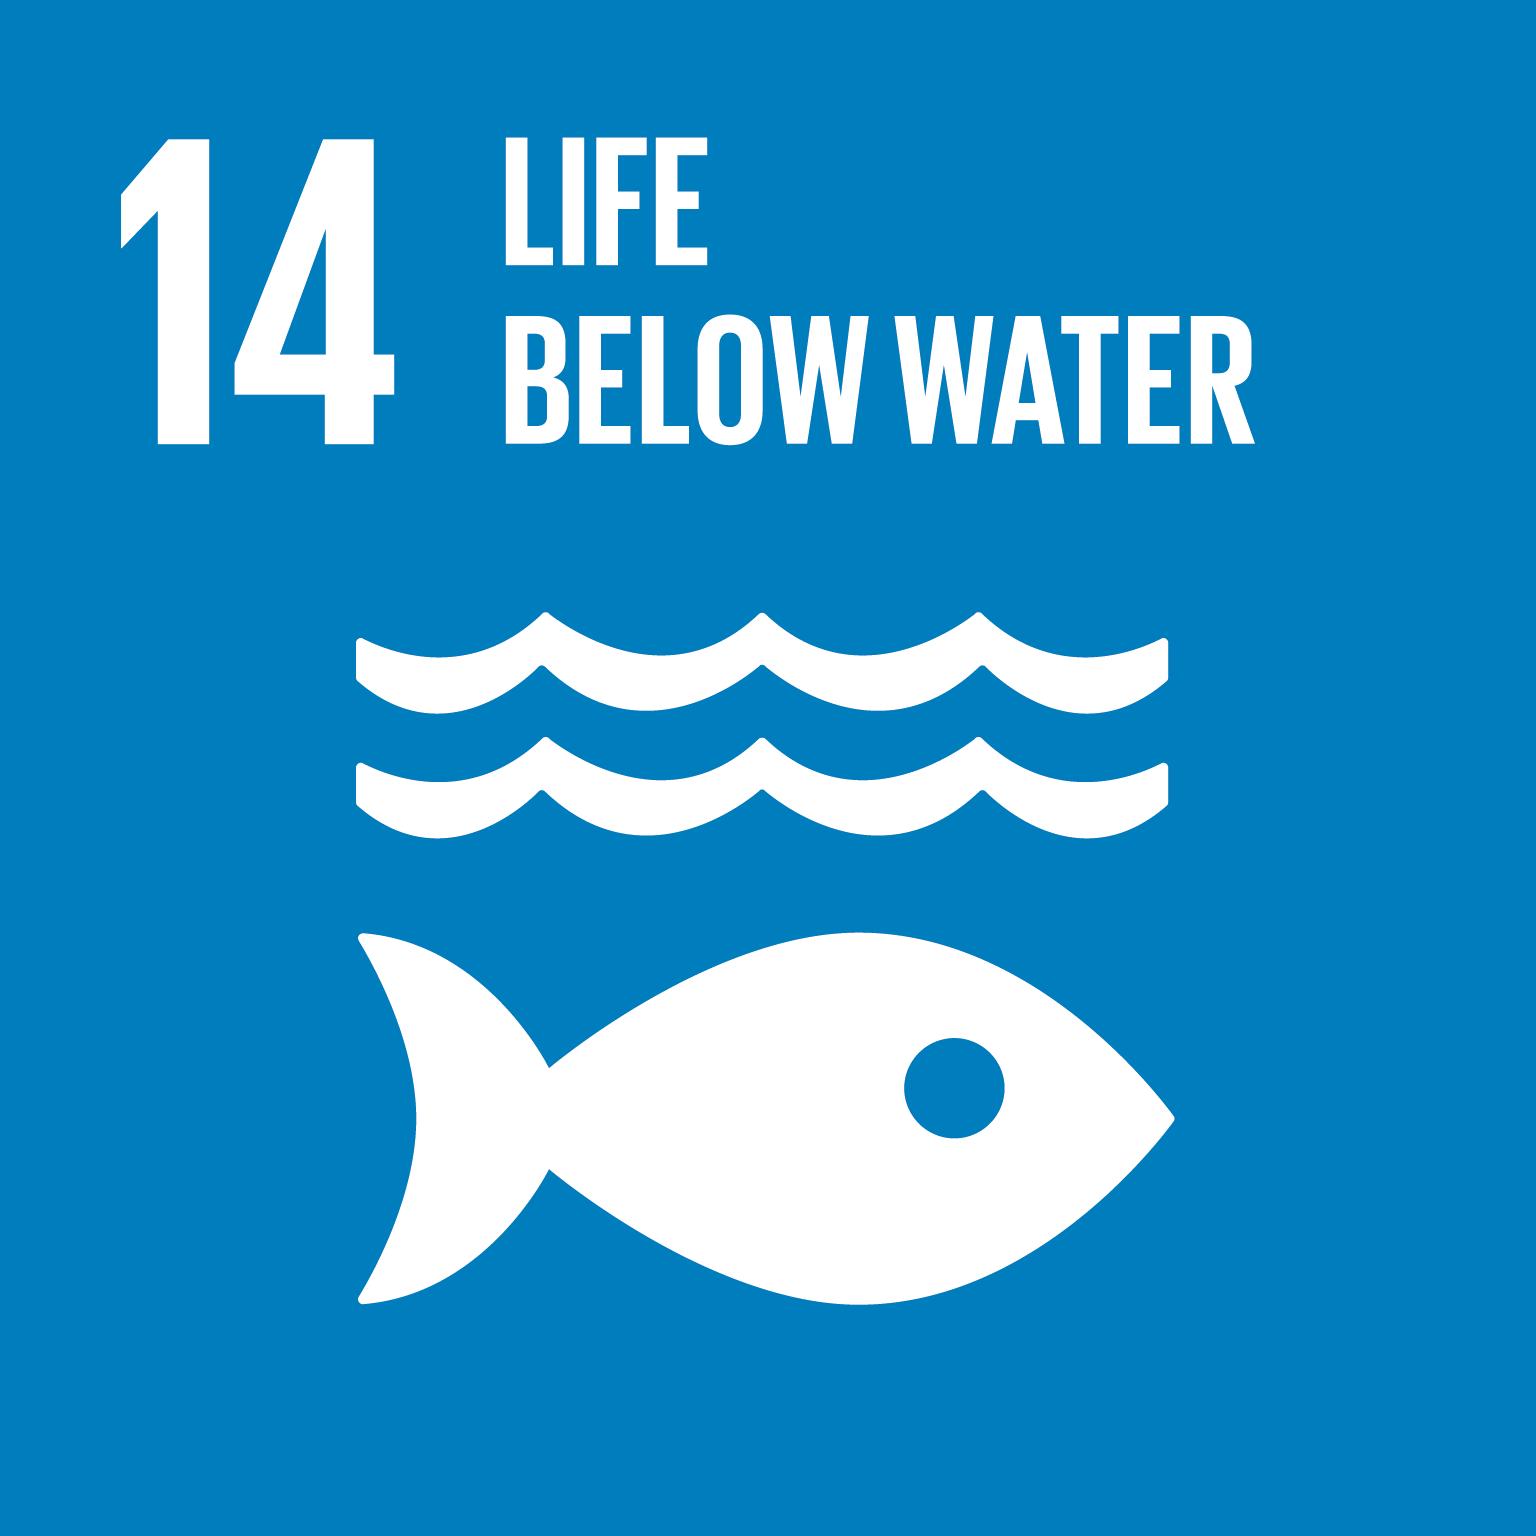 Life below water (14)